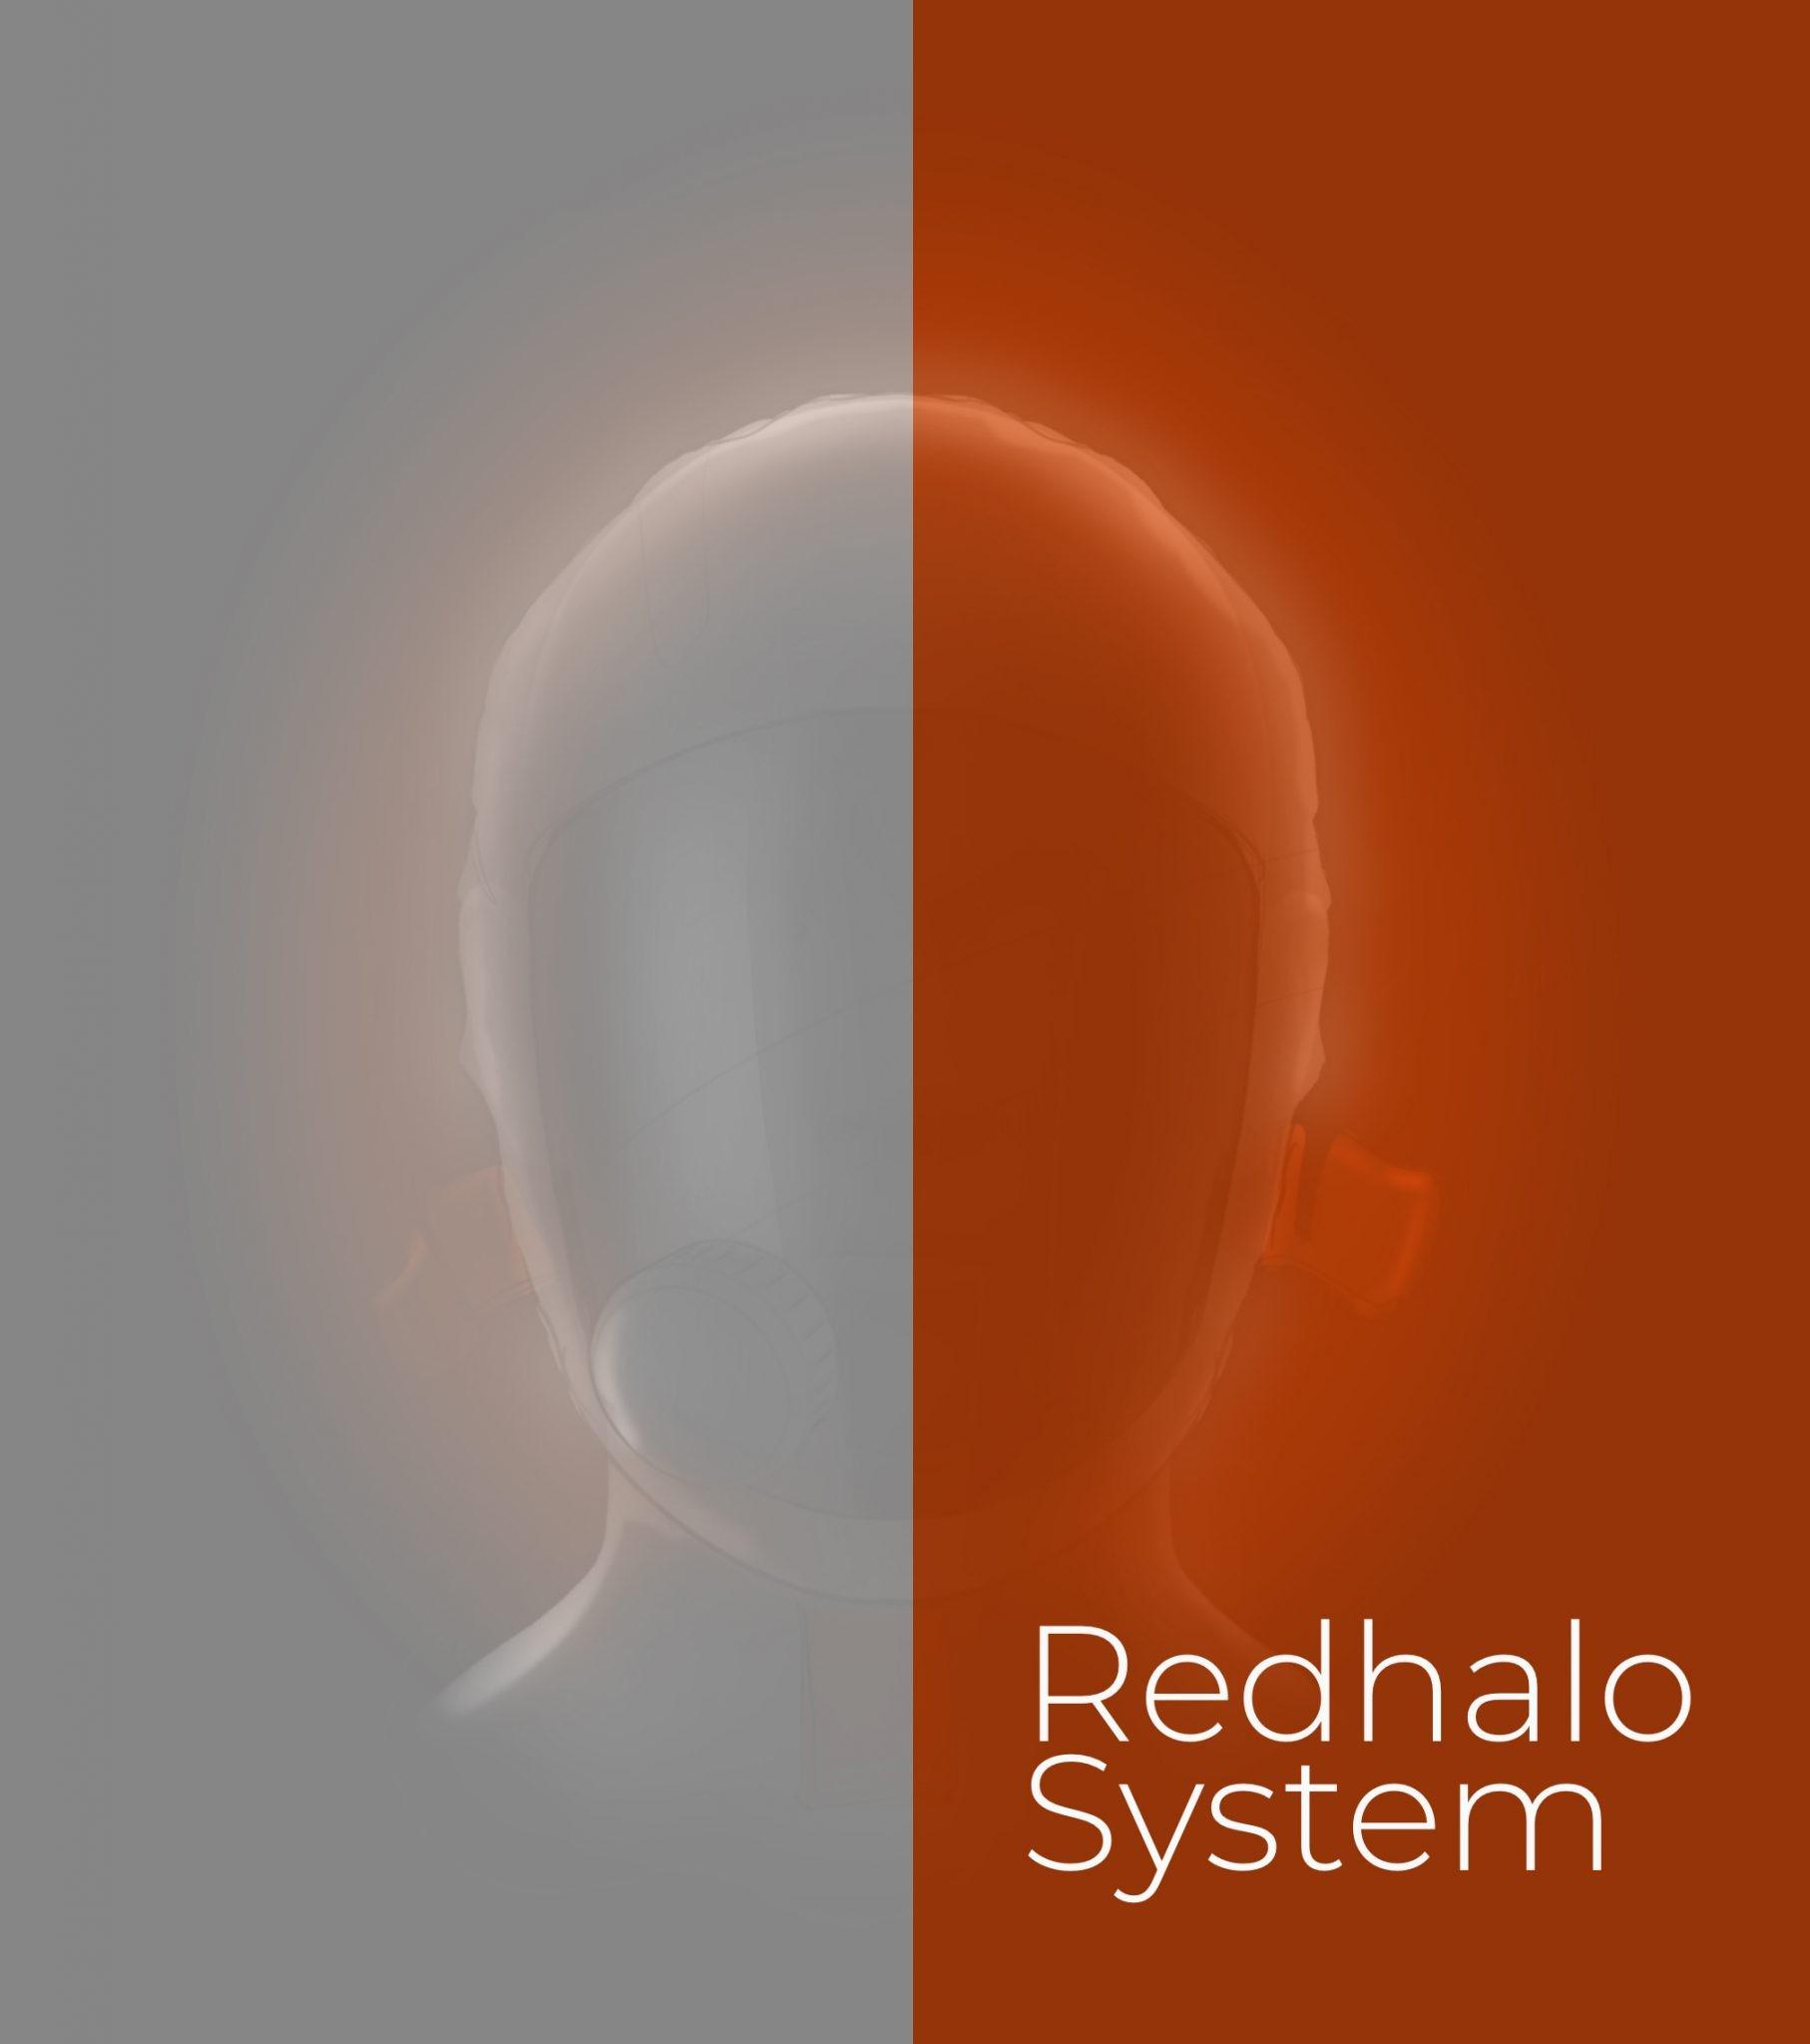 Vinnova Grant for Redhalo System